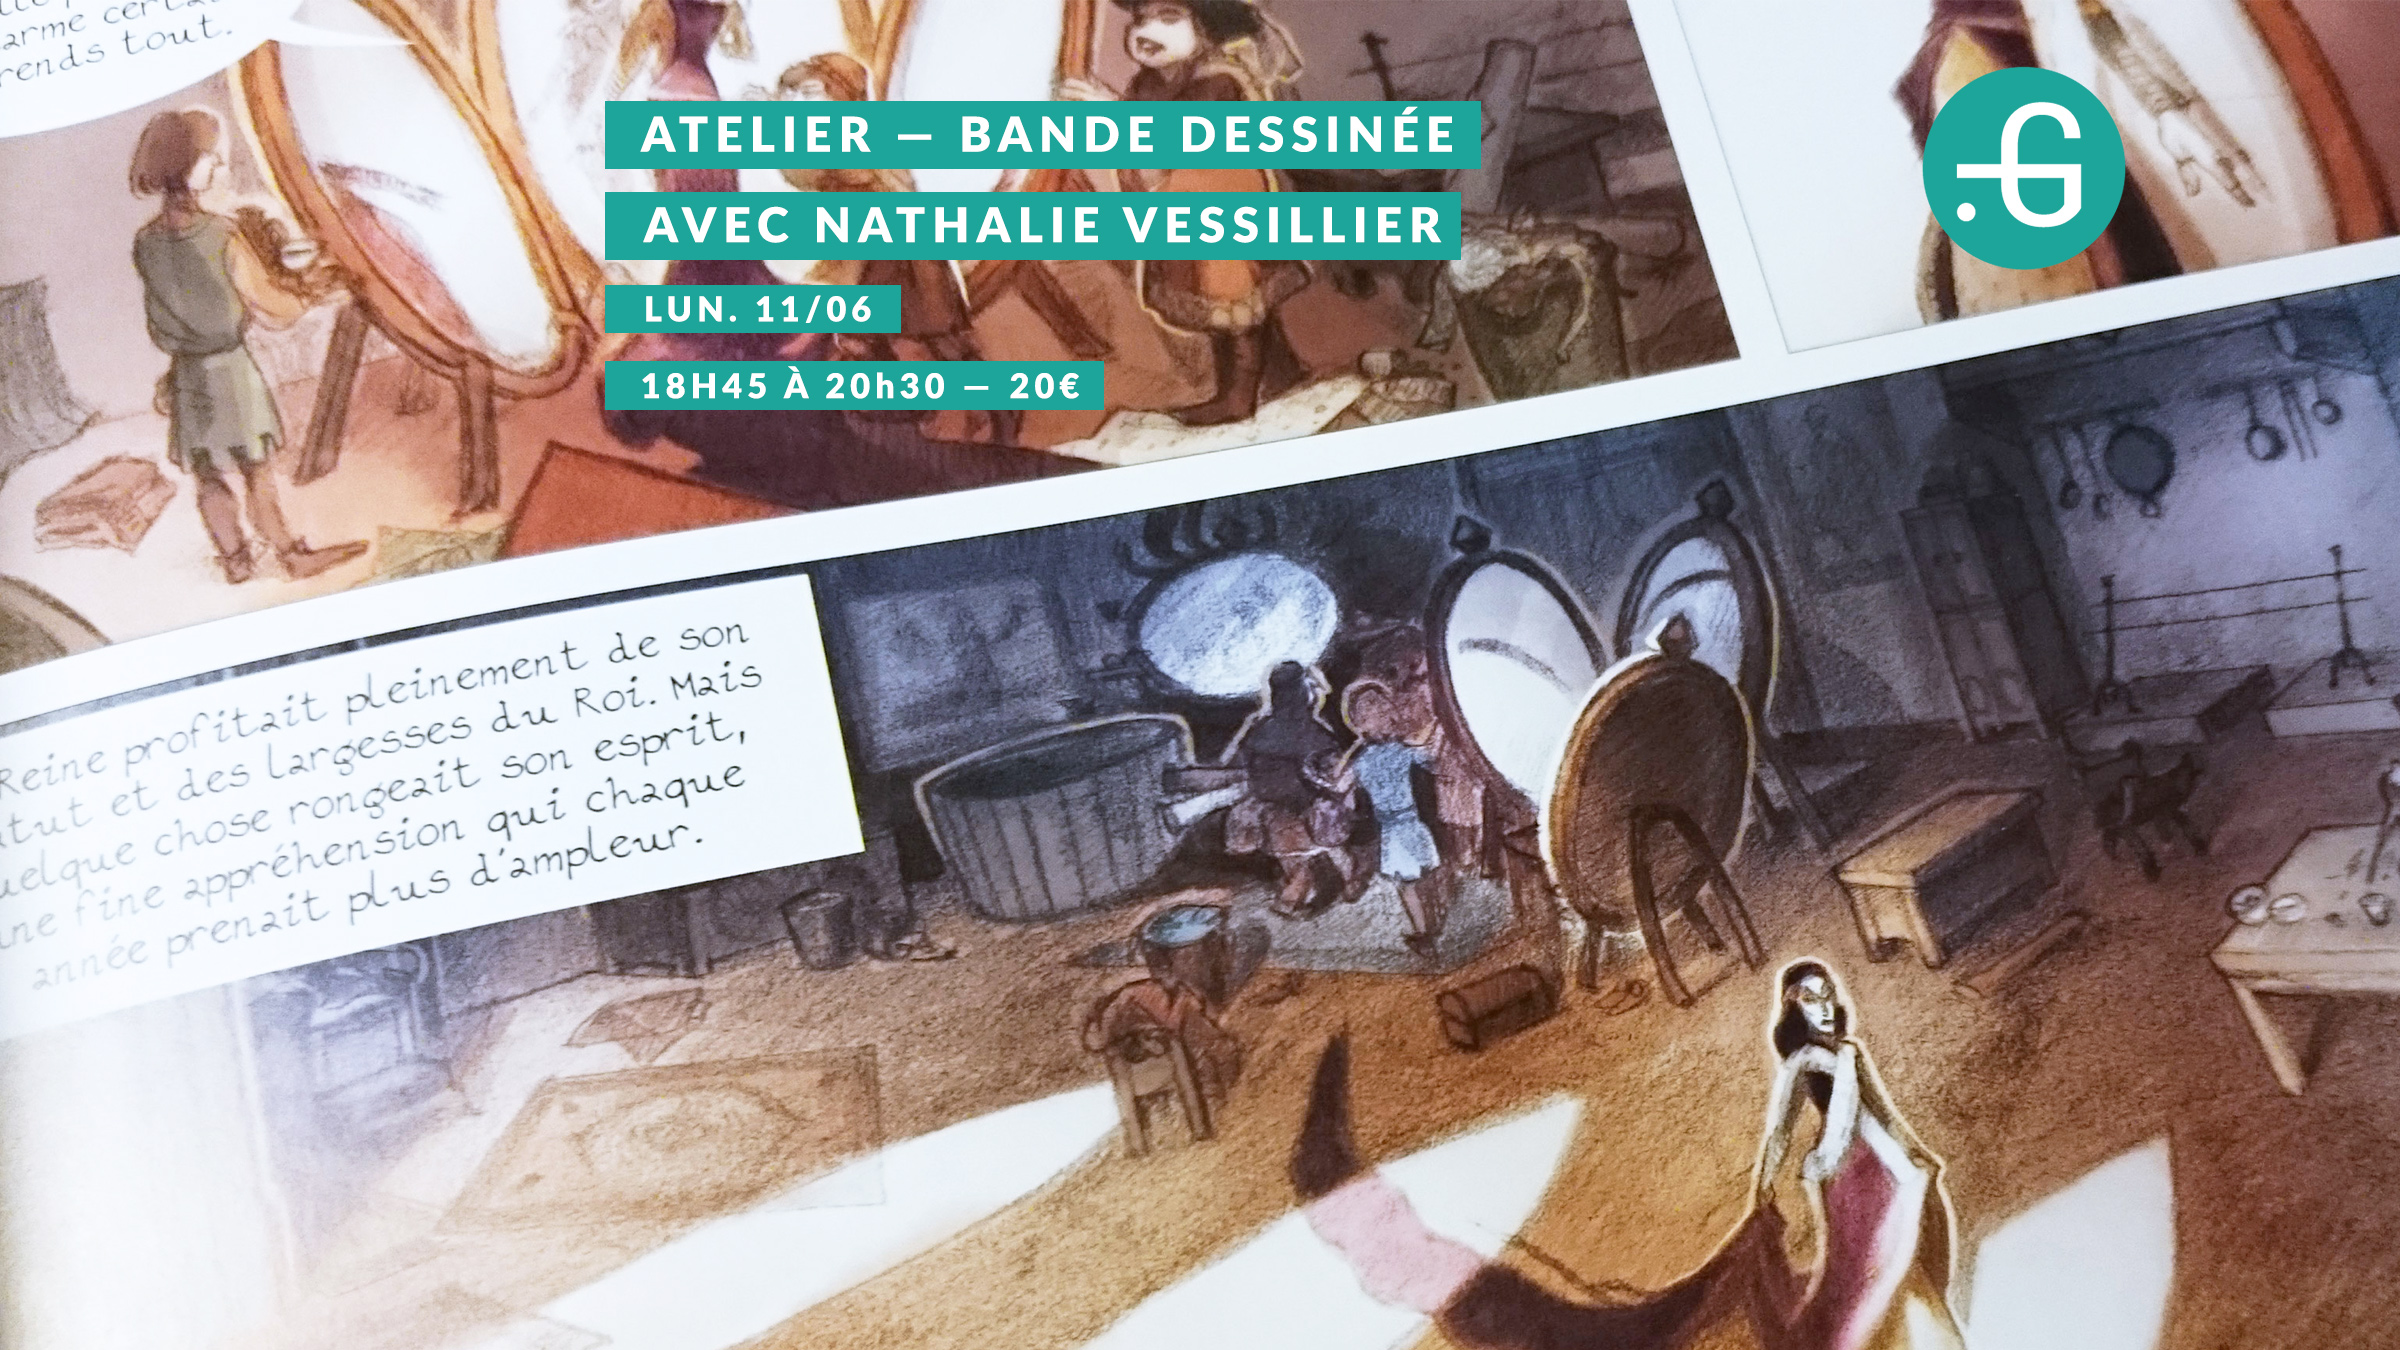 Atelier Nathalie Vessillier, 11 juin 2018